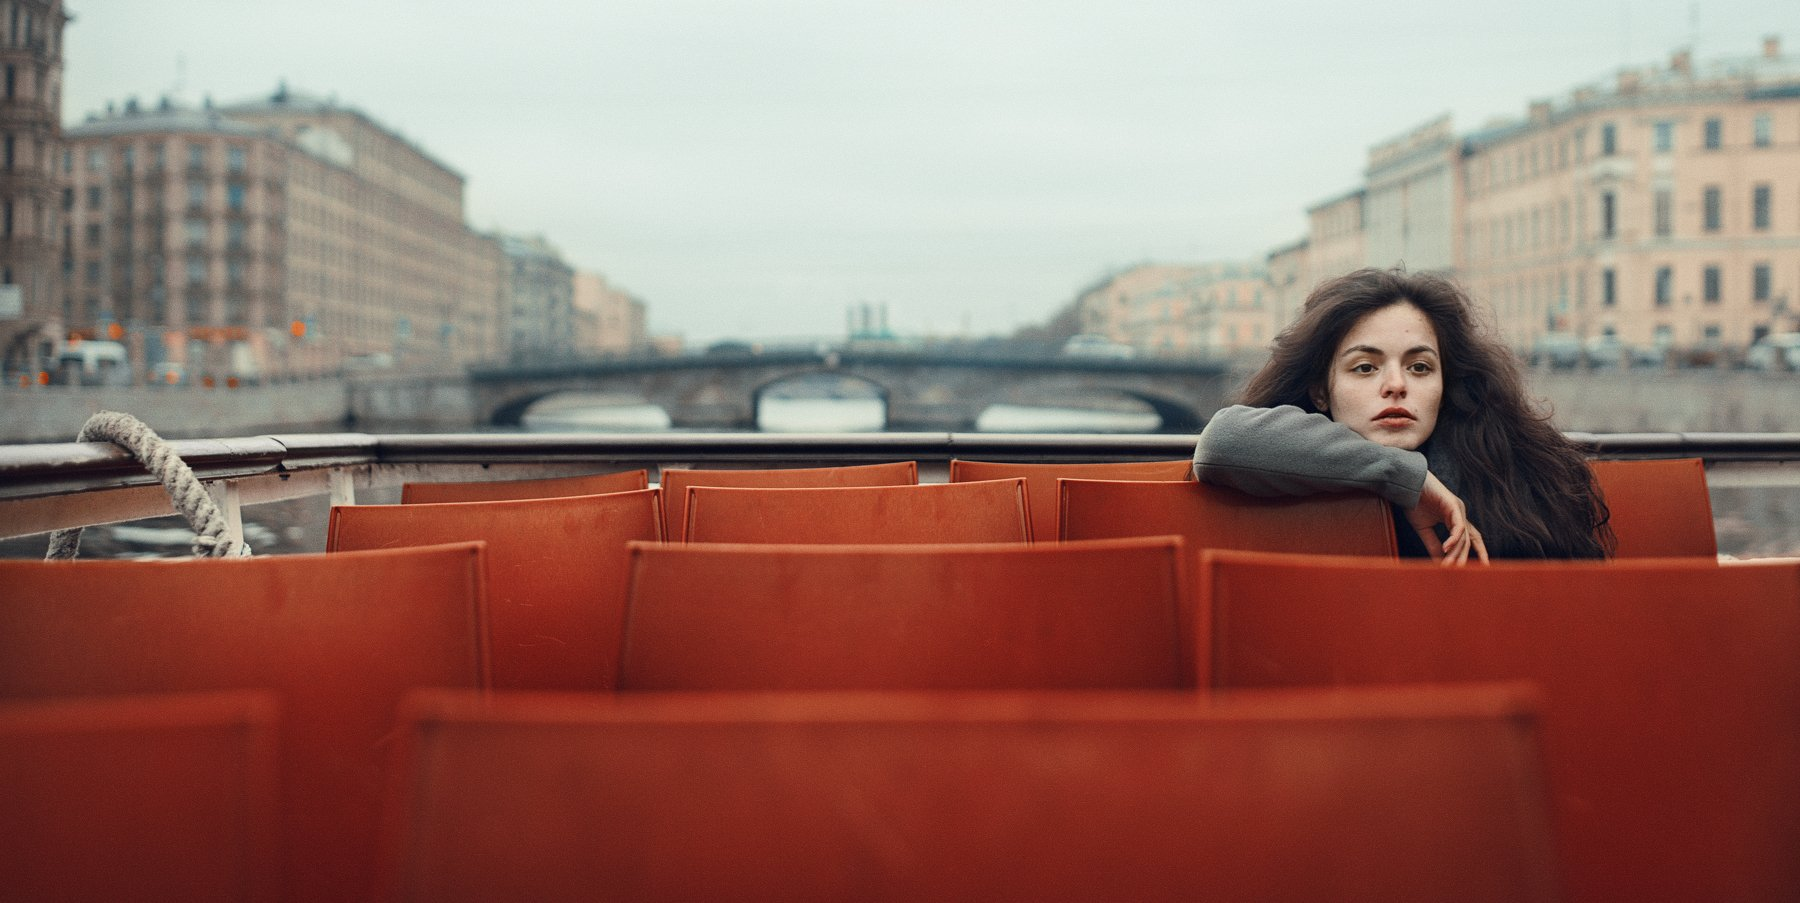 girl, spb, saint-petersburg, boat, water, portrait, Роман Филиппов